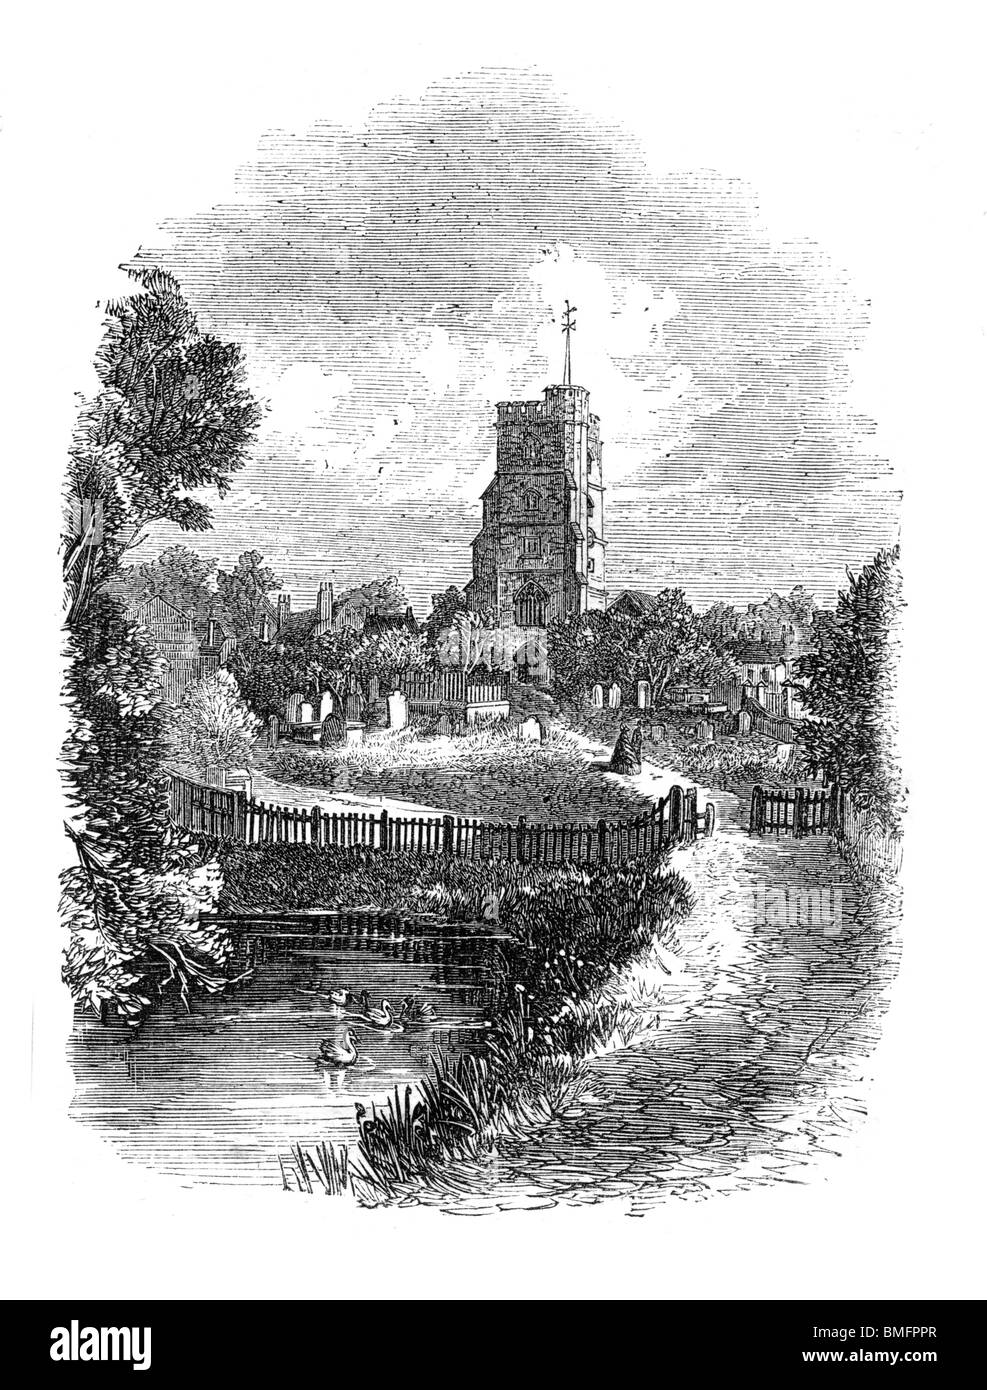 Black and White Illustration of All Saints Church, Fulham, London, Circa 1863 - Stock Image